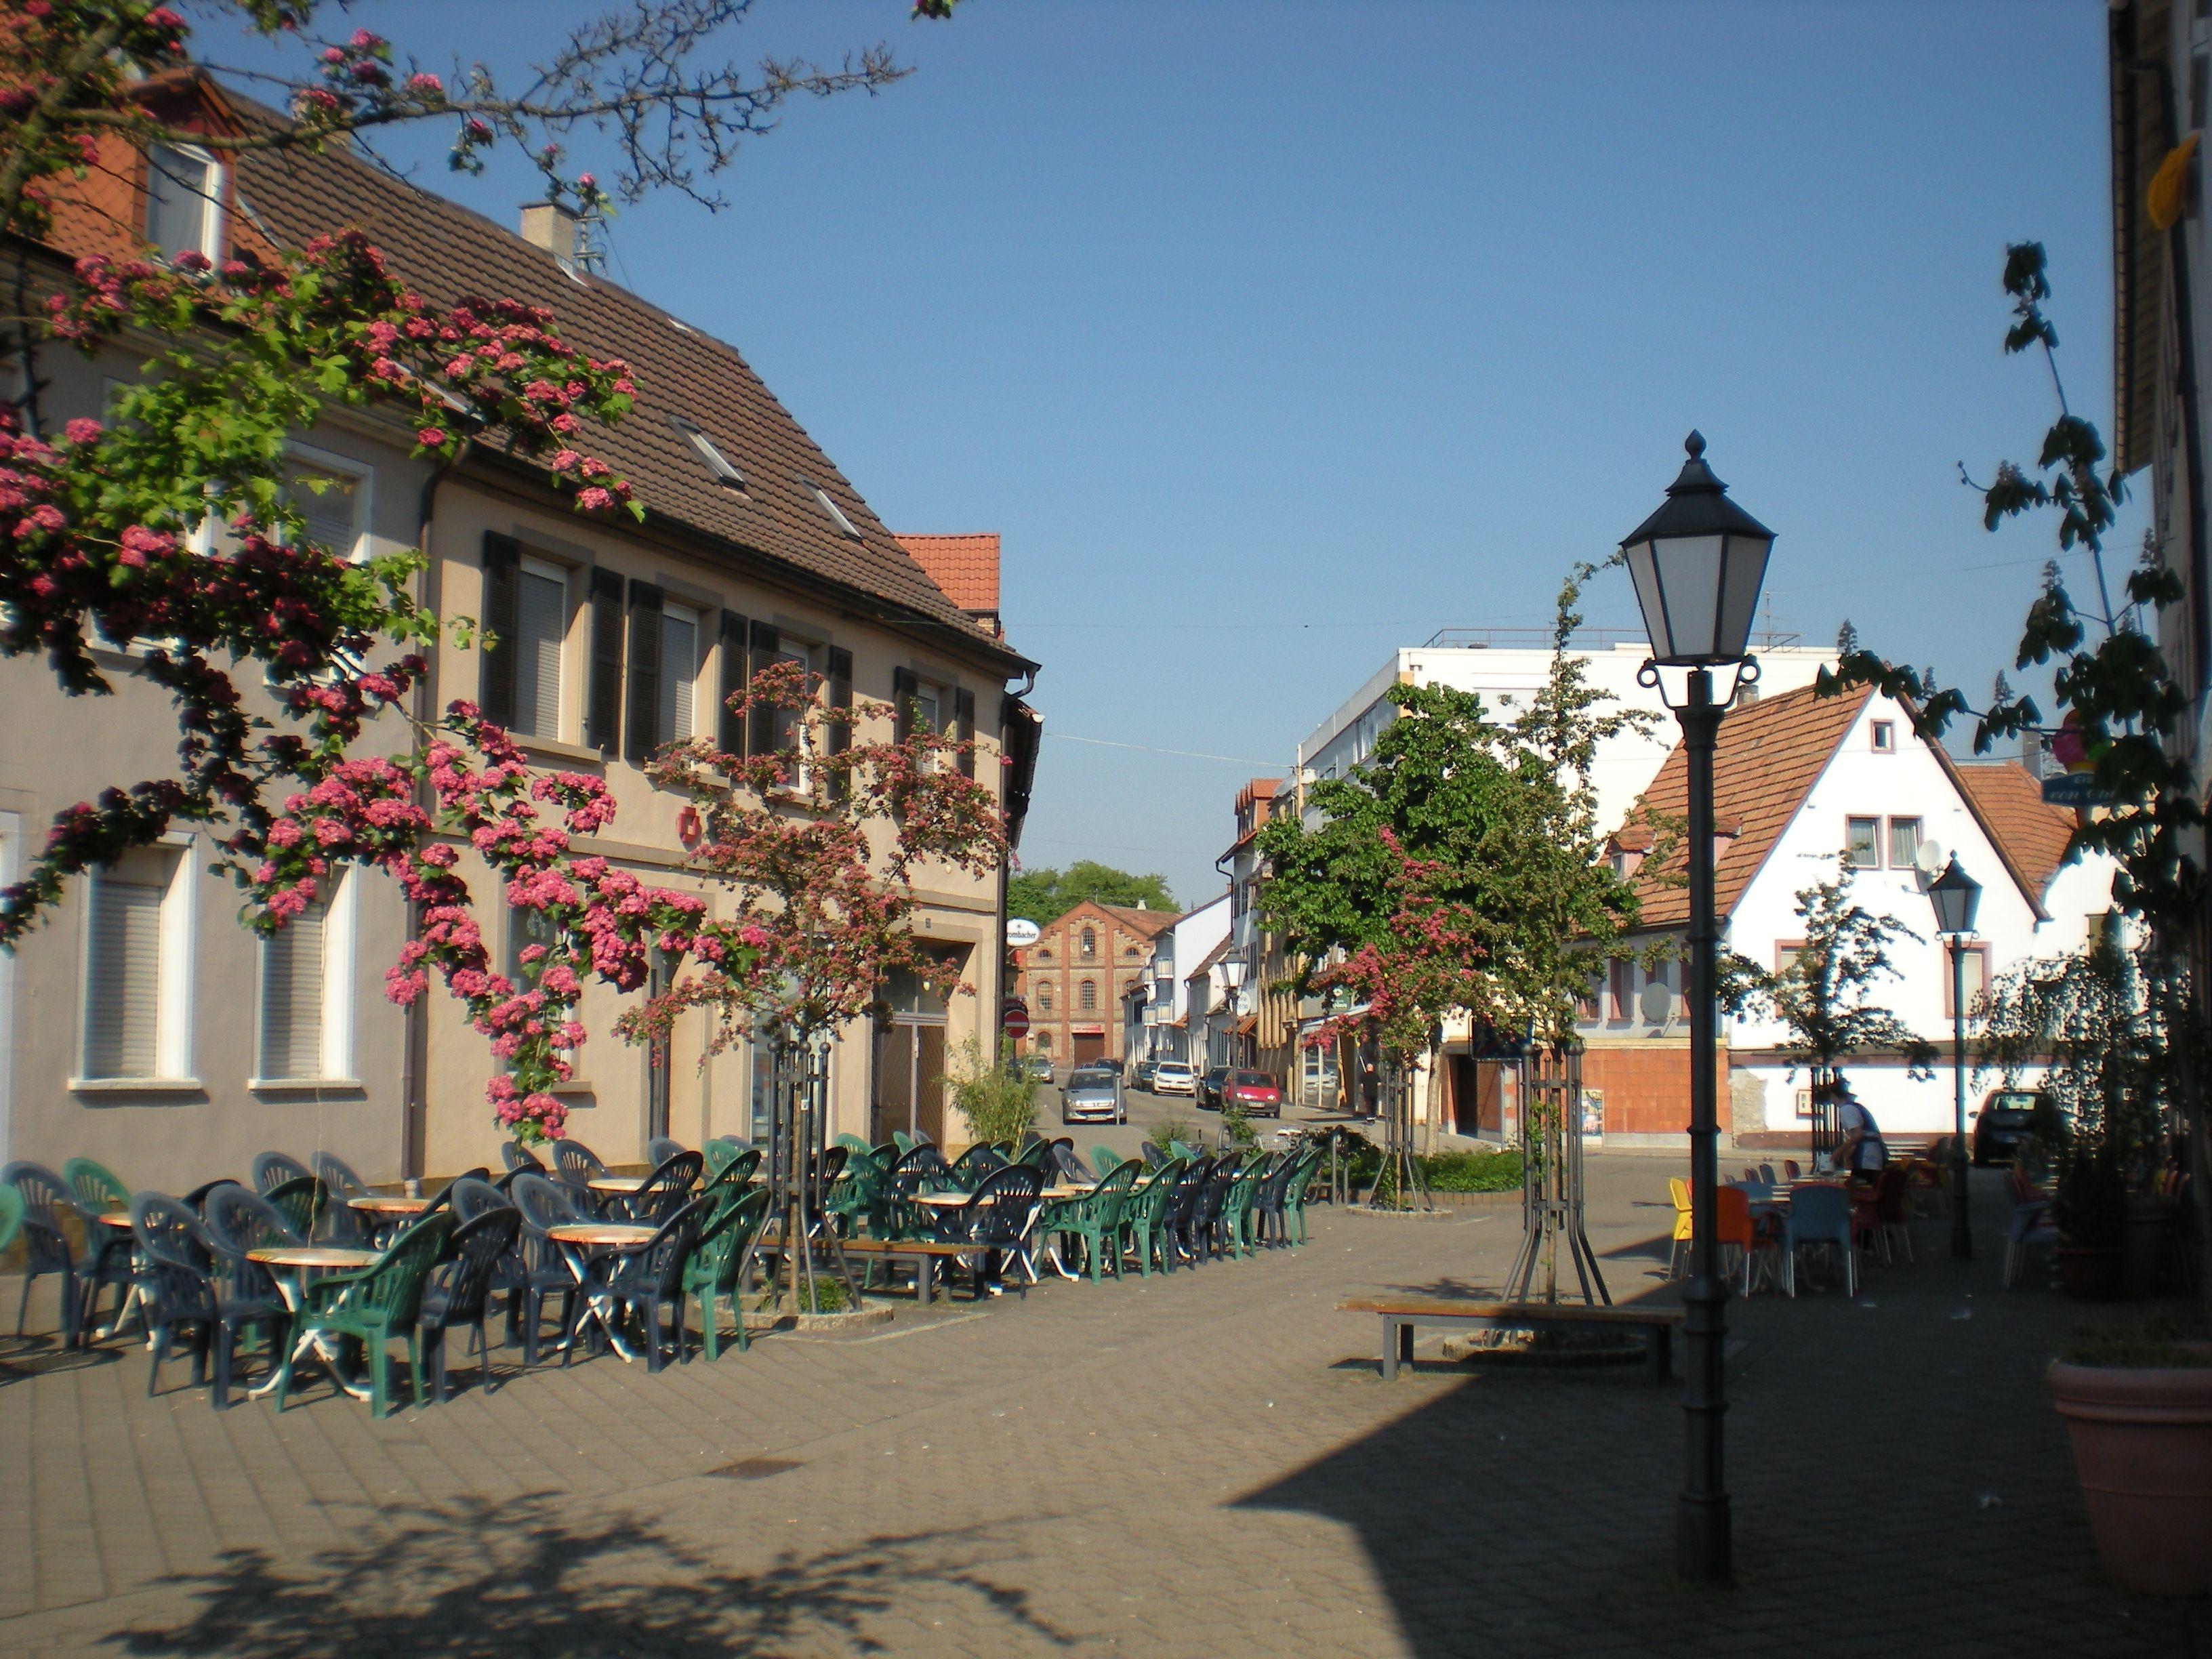 Germersheim Germersheim Favorite Places Places